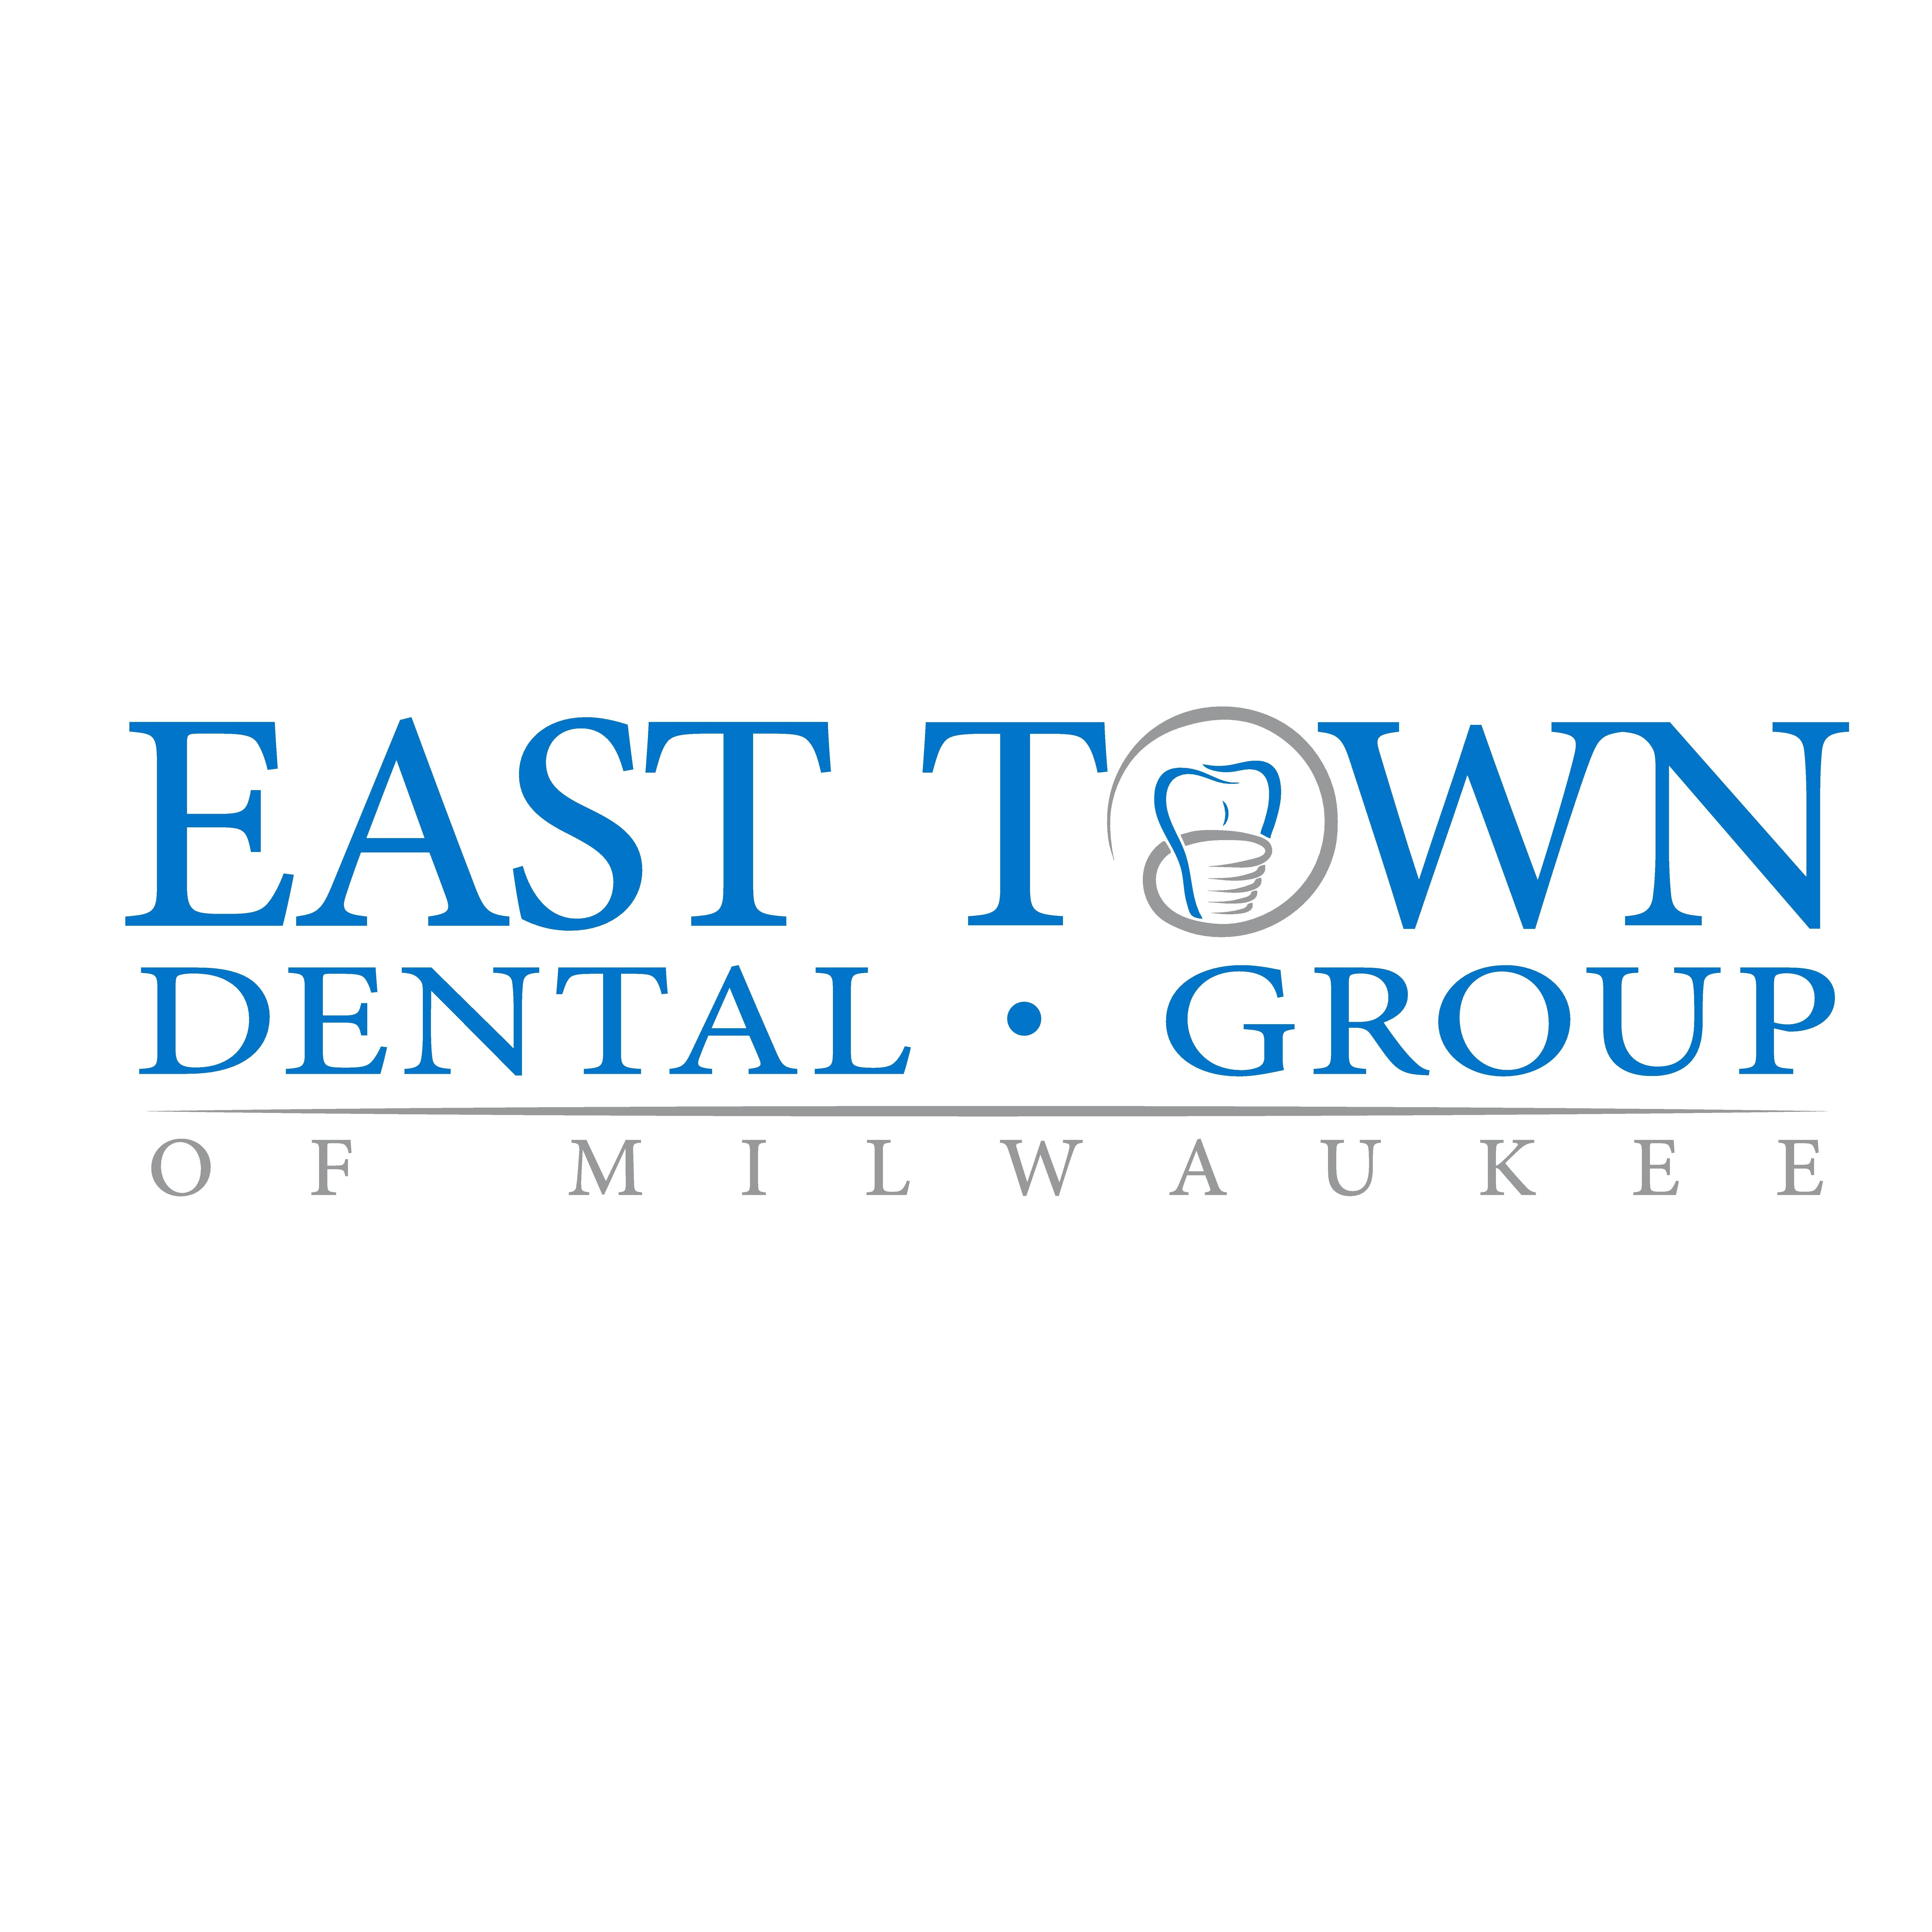 Major Dental Clinics of Milwaukee